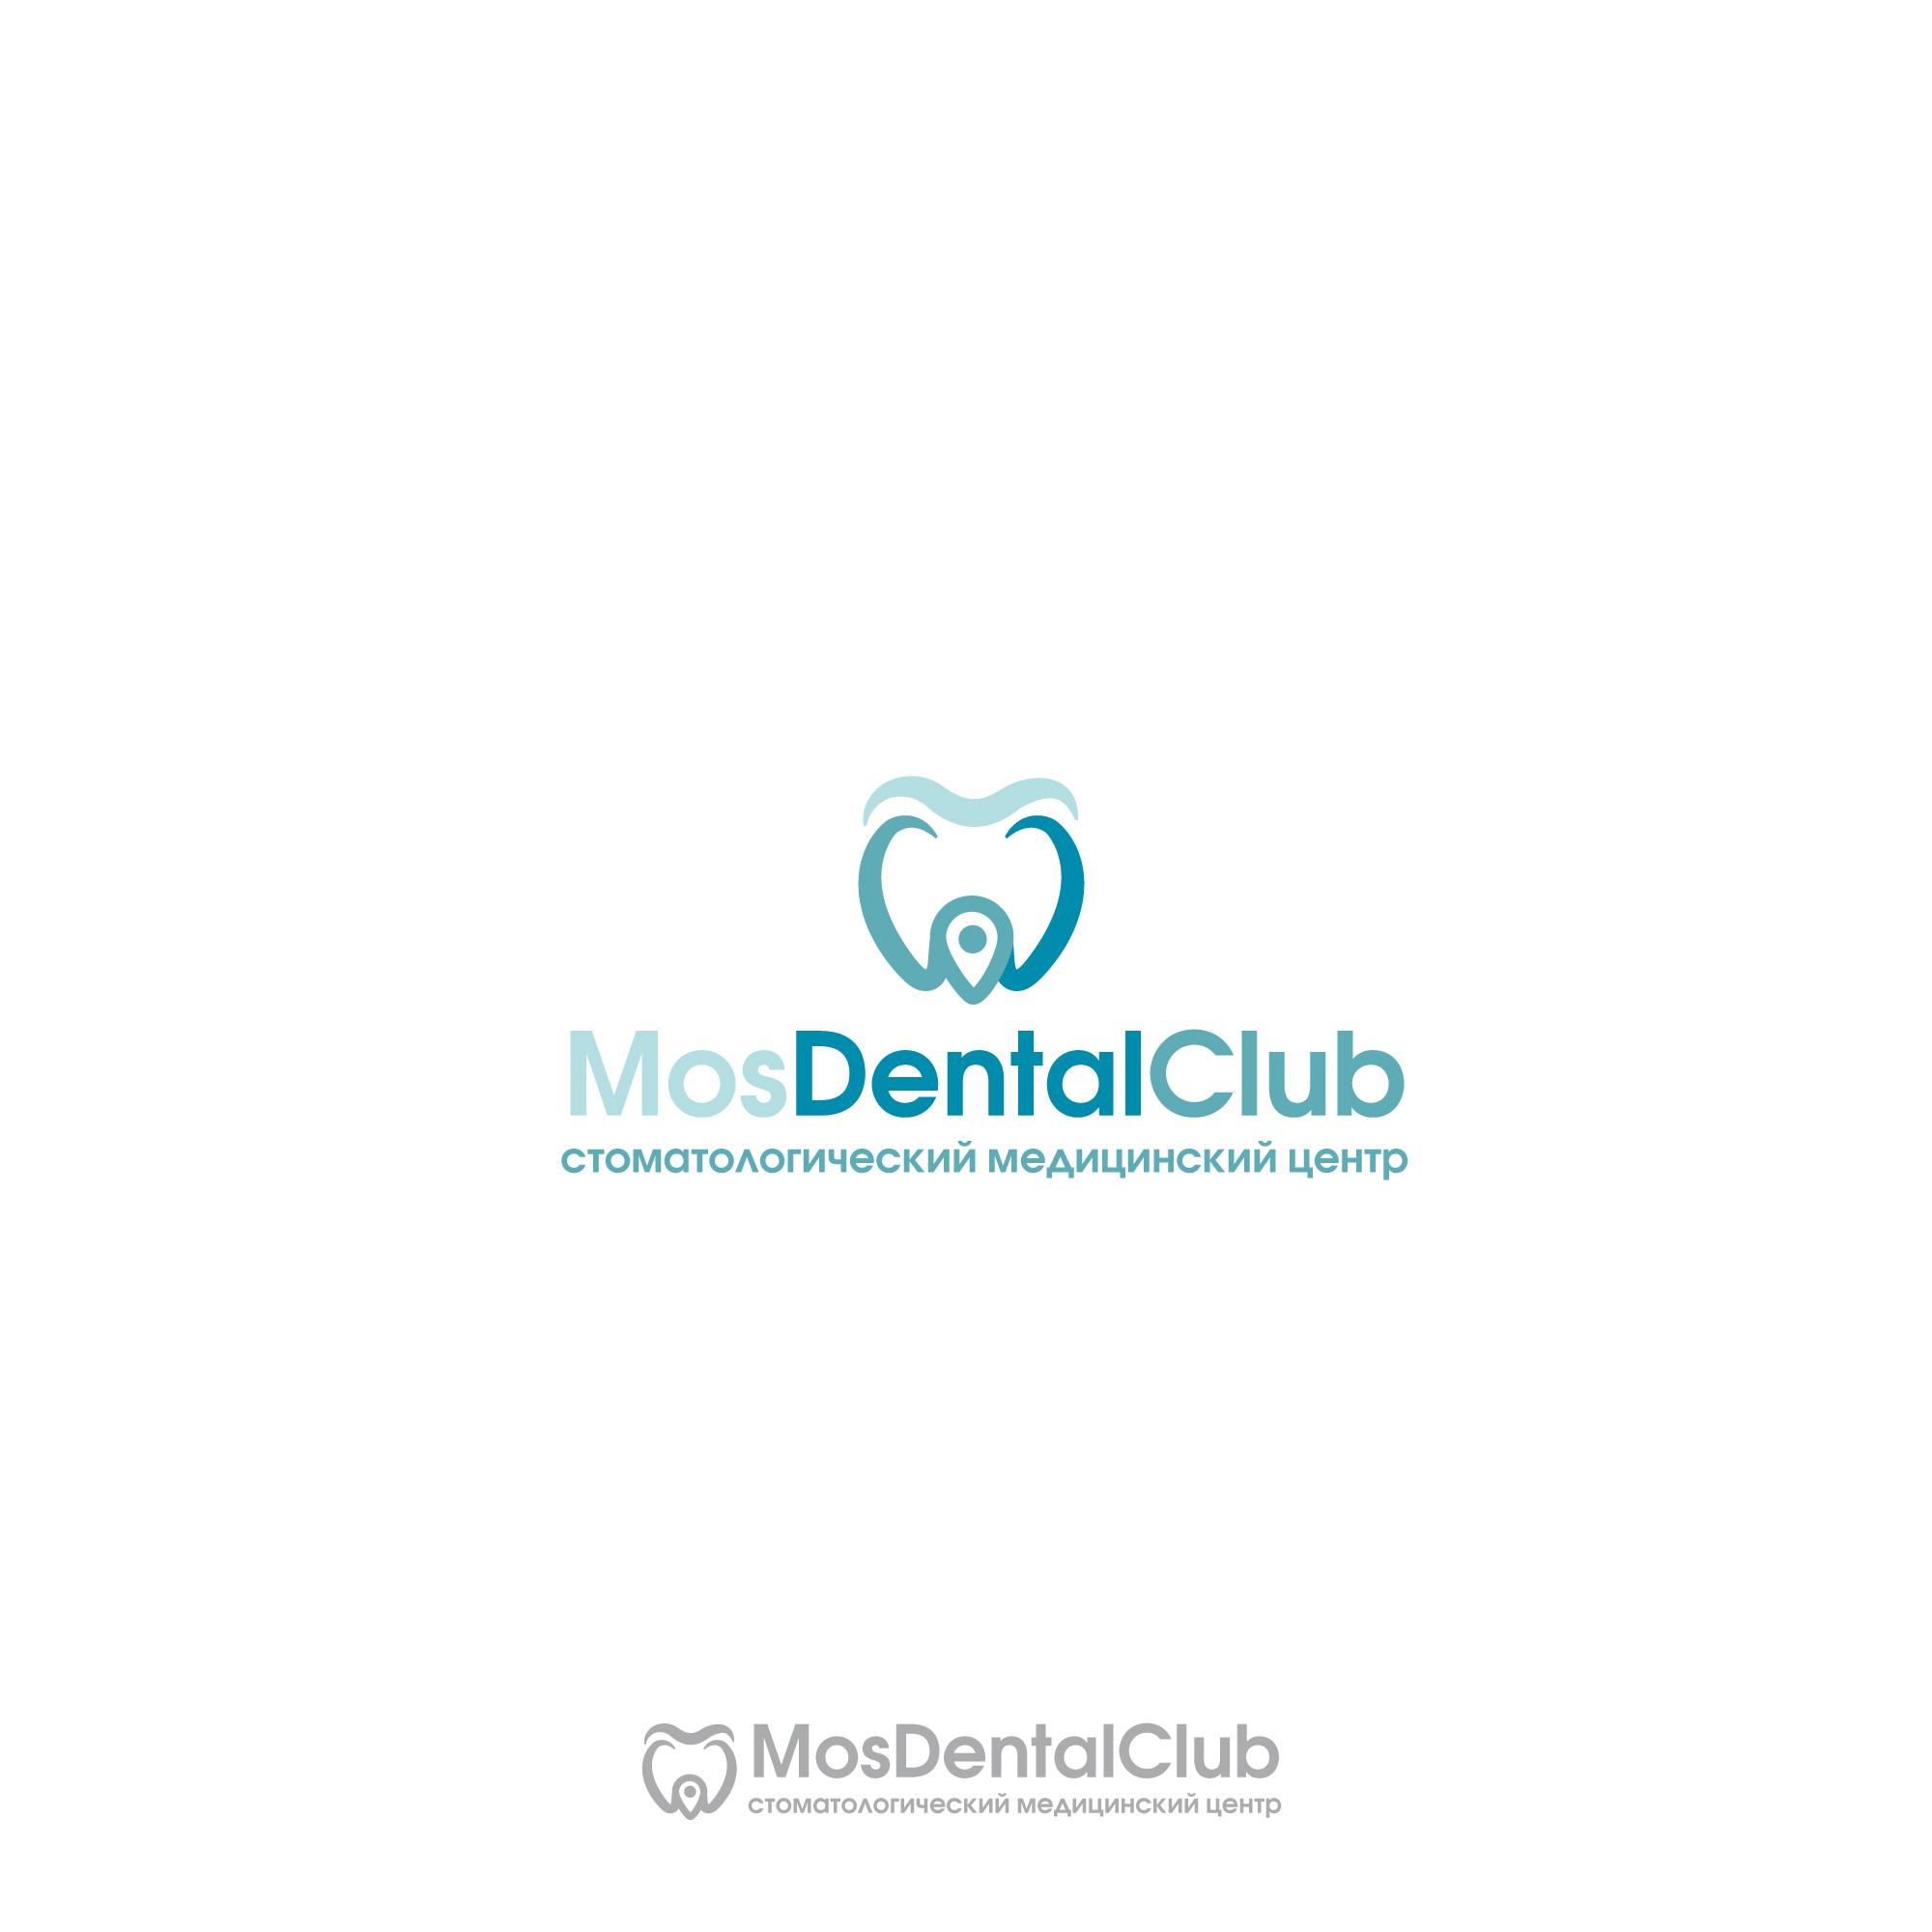 Разработка логотипа стоматологического медицинского центра фото f_6085e4b01ee6325c.jpg